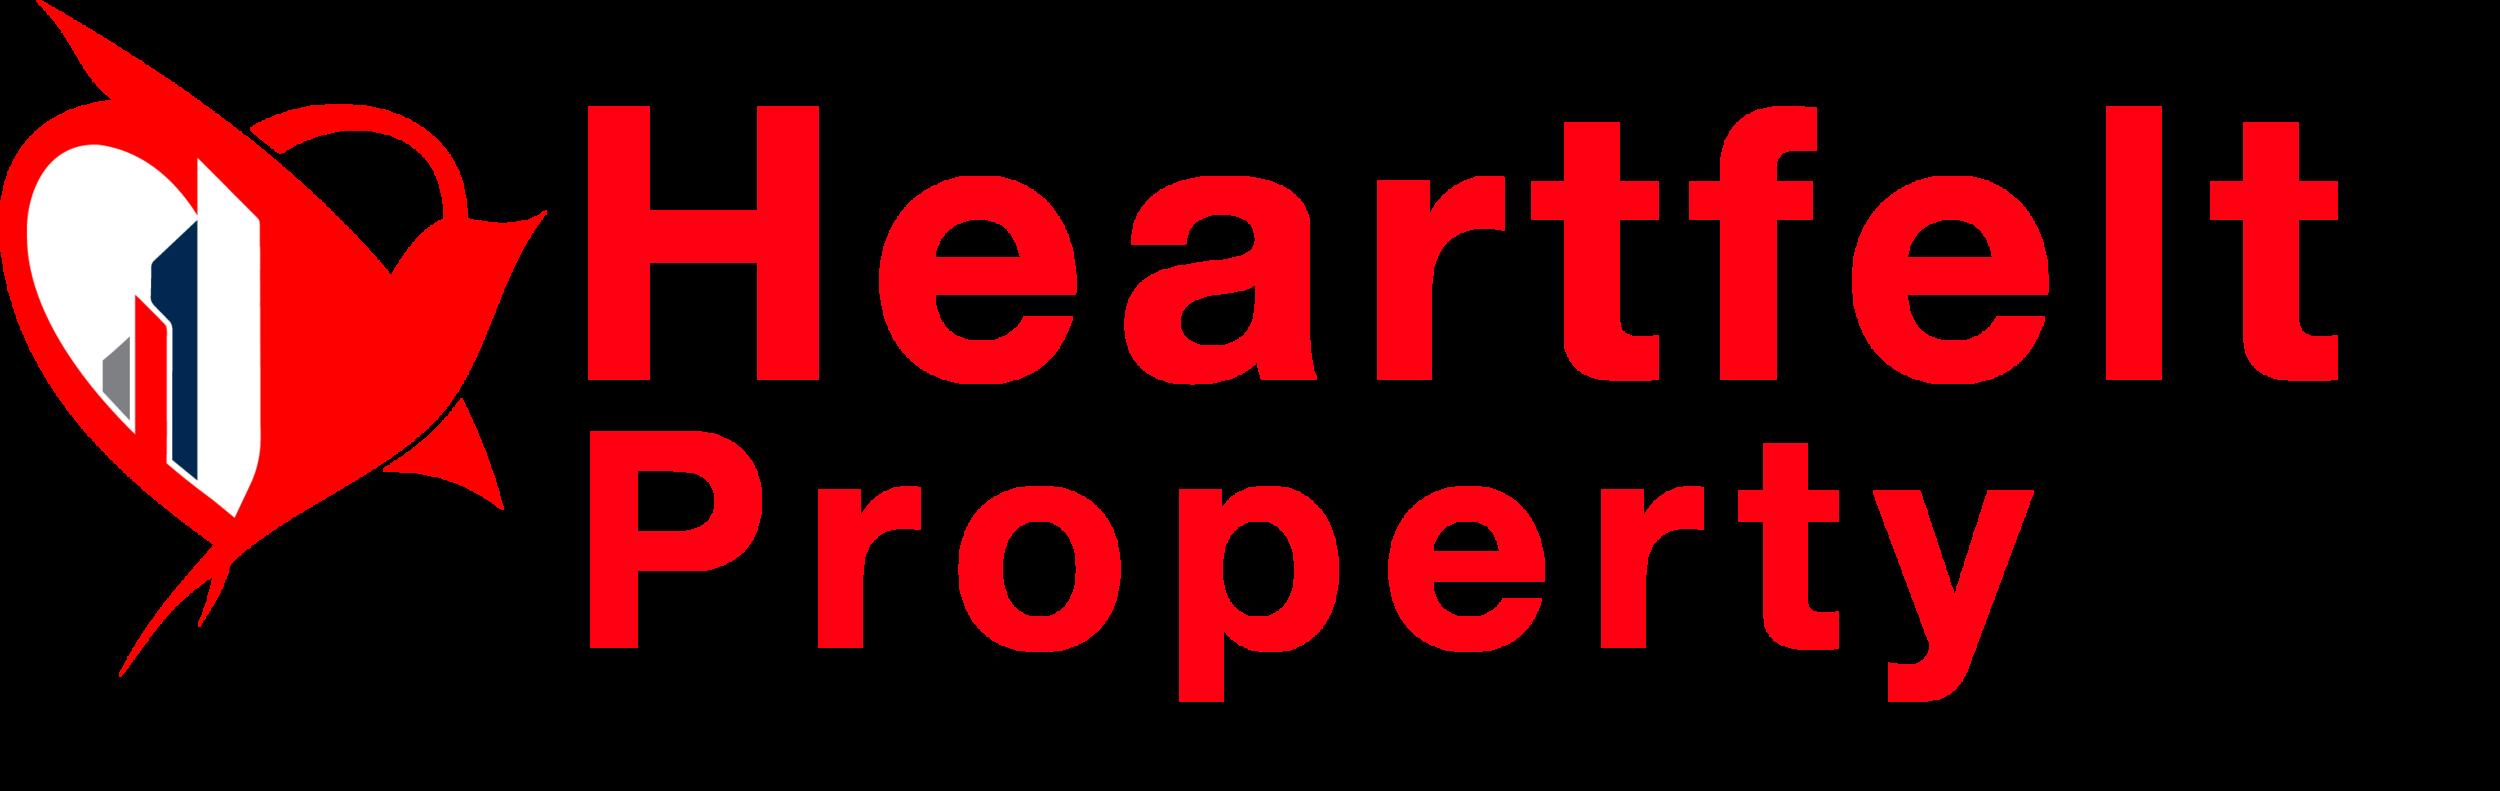 heartfelt_property_logo